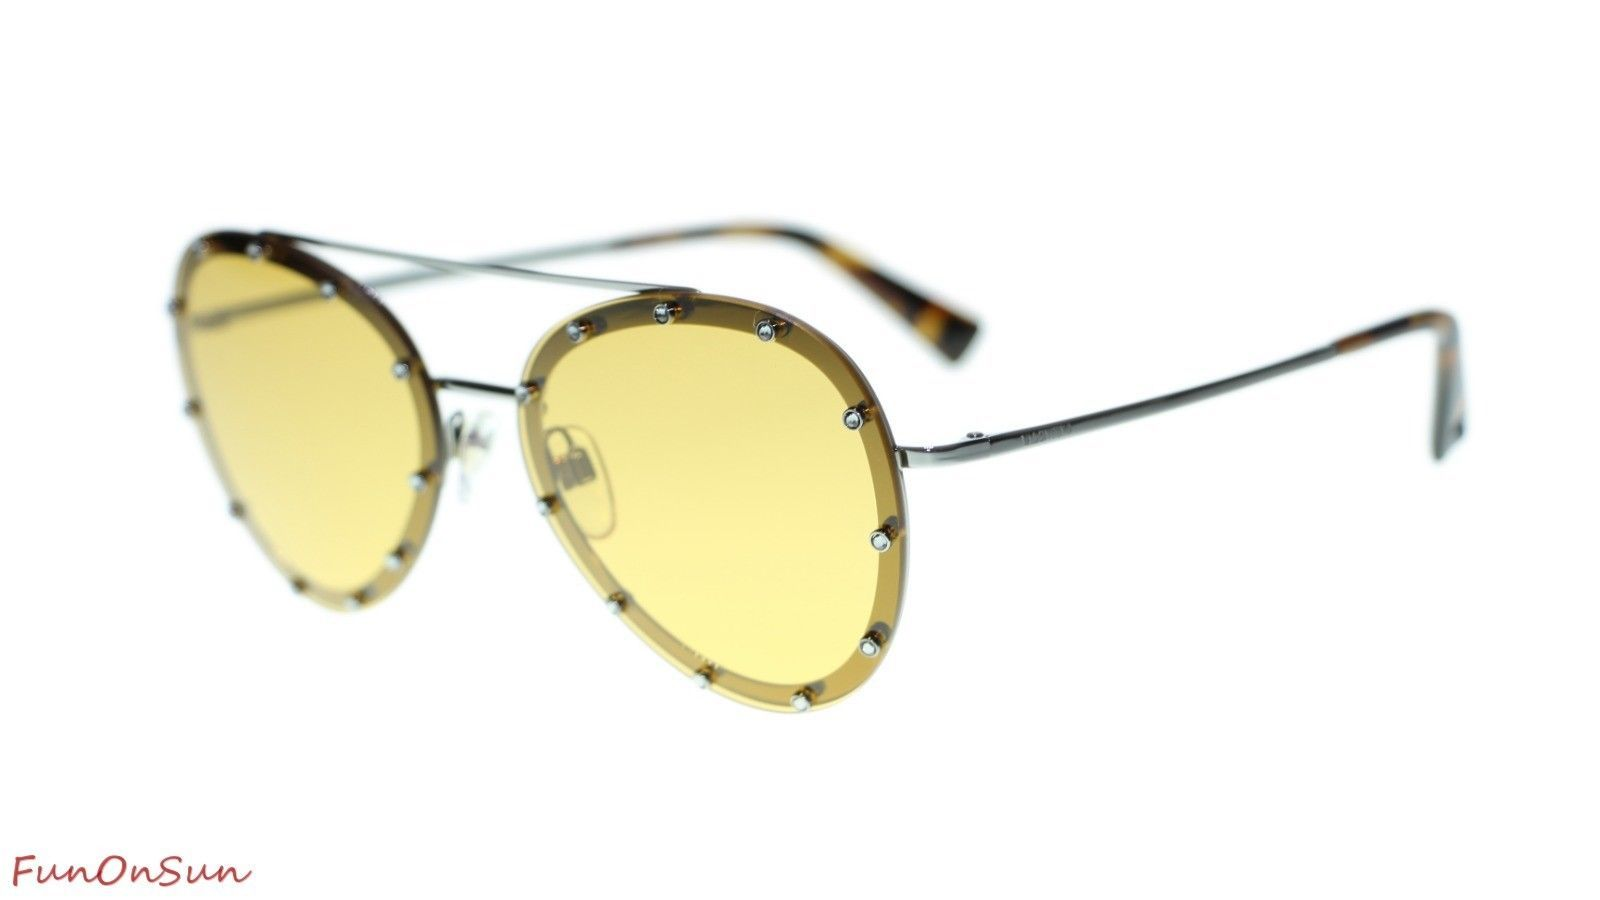 Valentino Sunglasses VA2013 300585 Gunmetal/Yellow Lens Italian Authentic 58mm